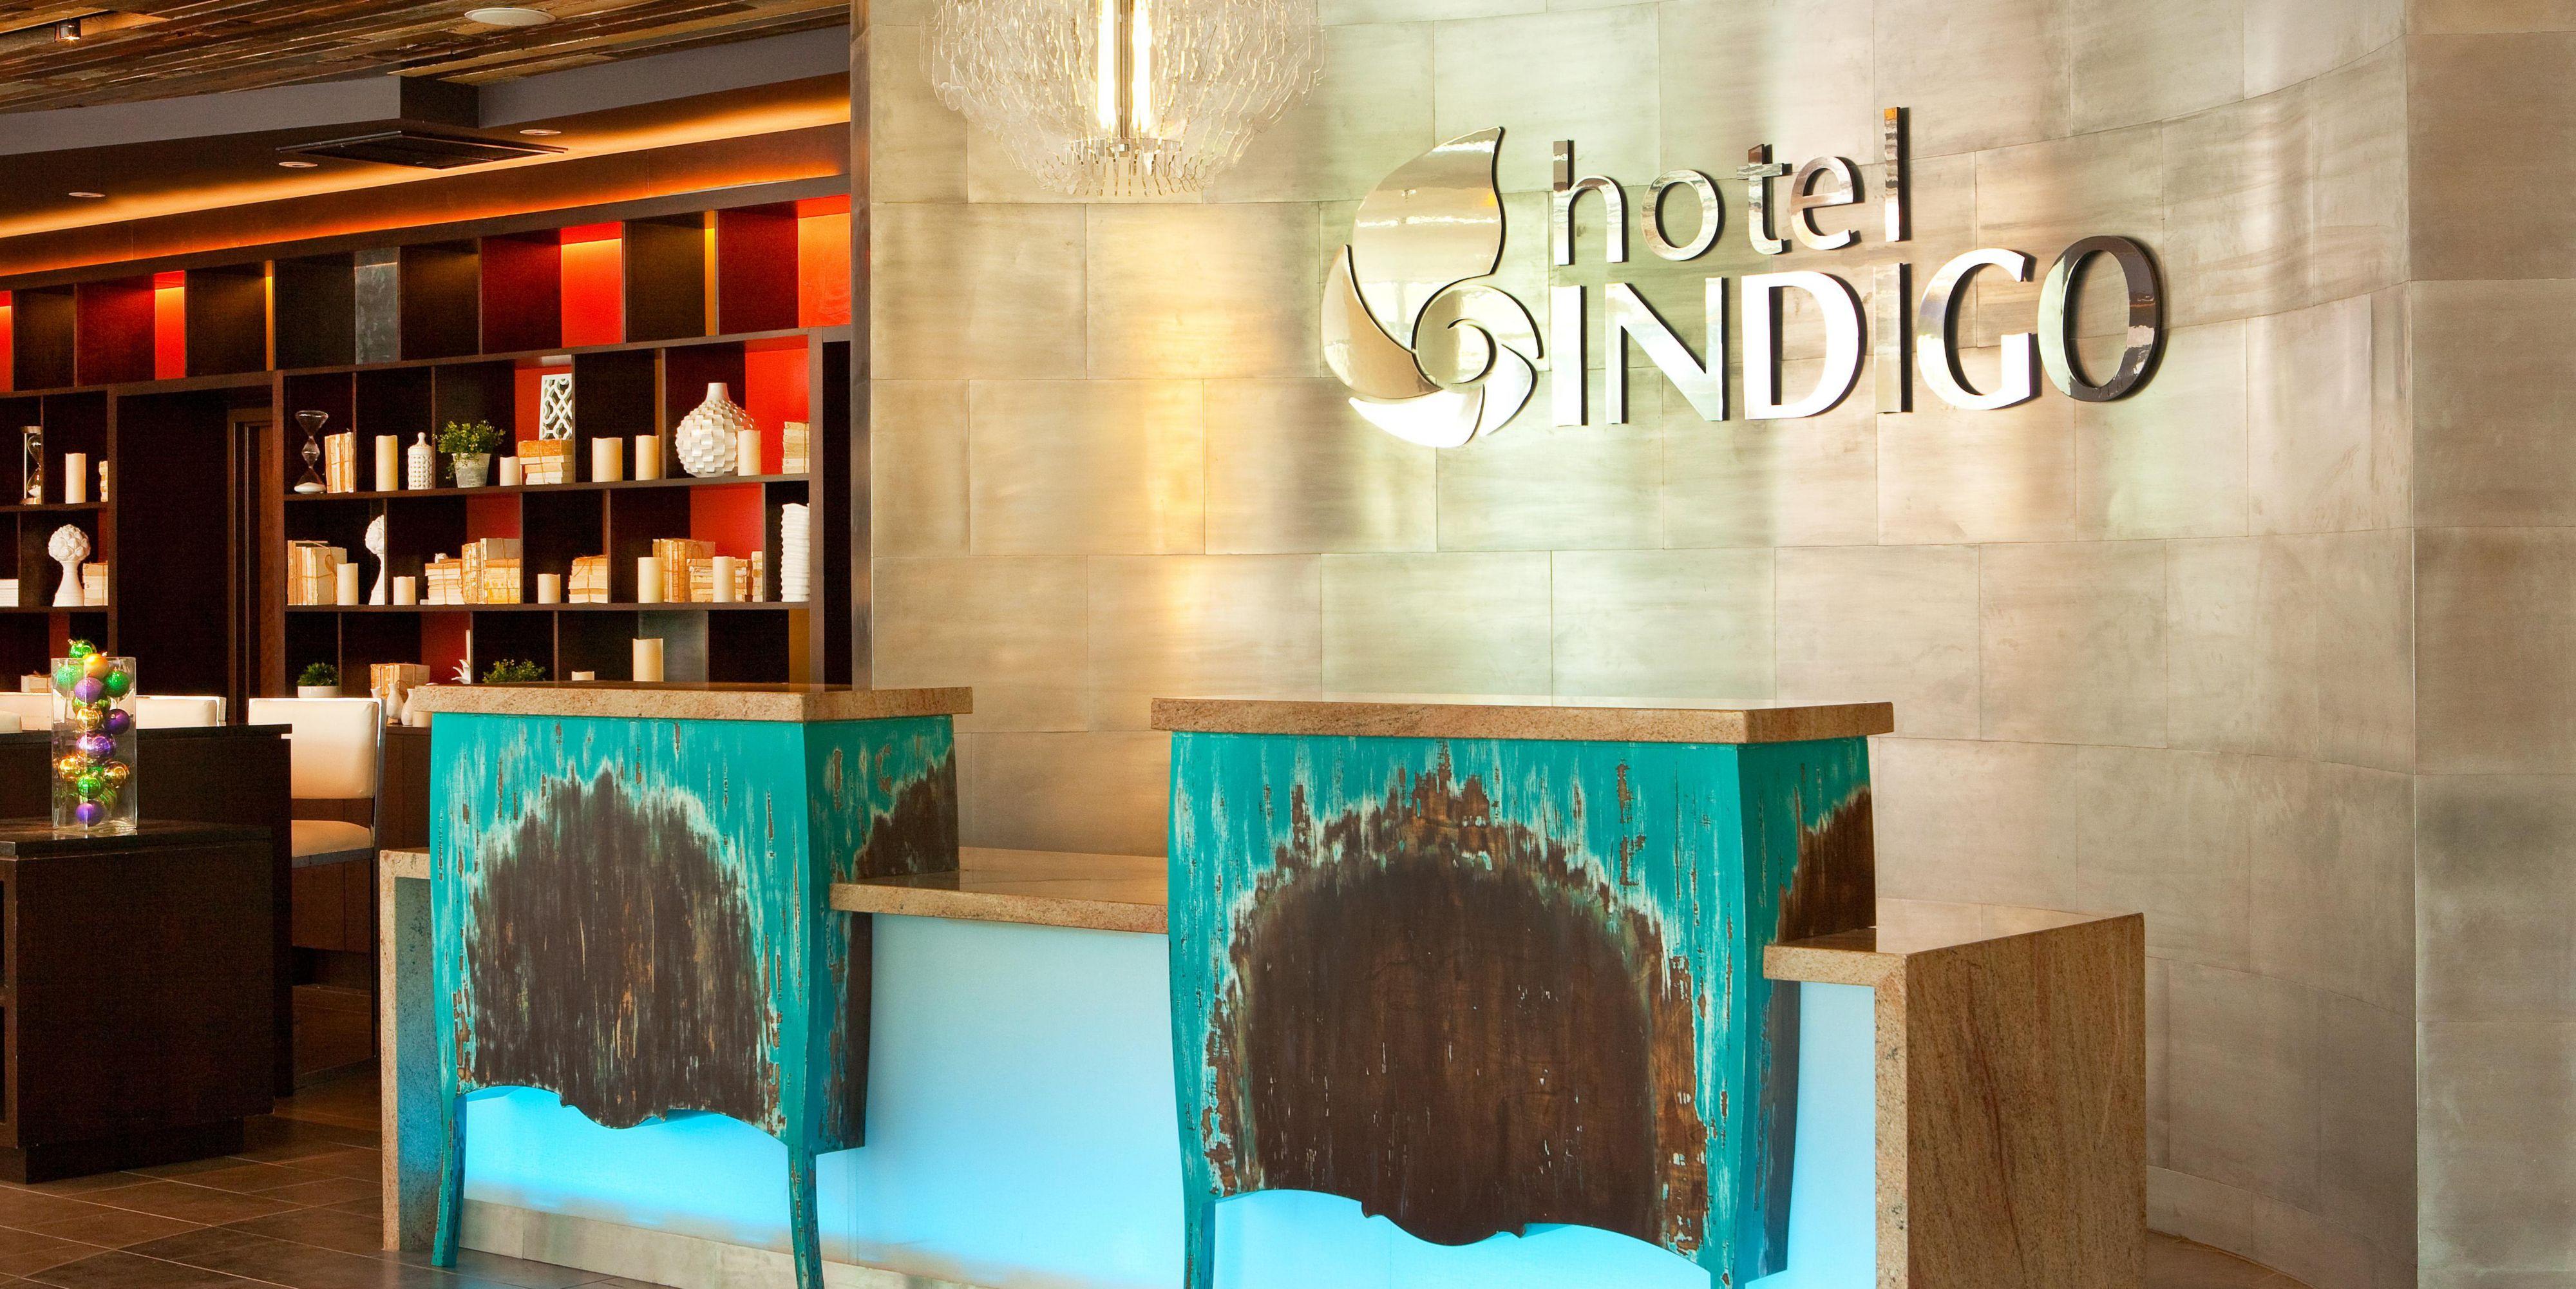 Home Hotel Indigo New Orleans Hotels Image Banner